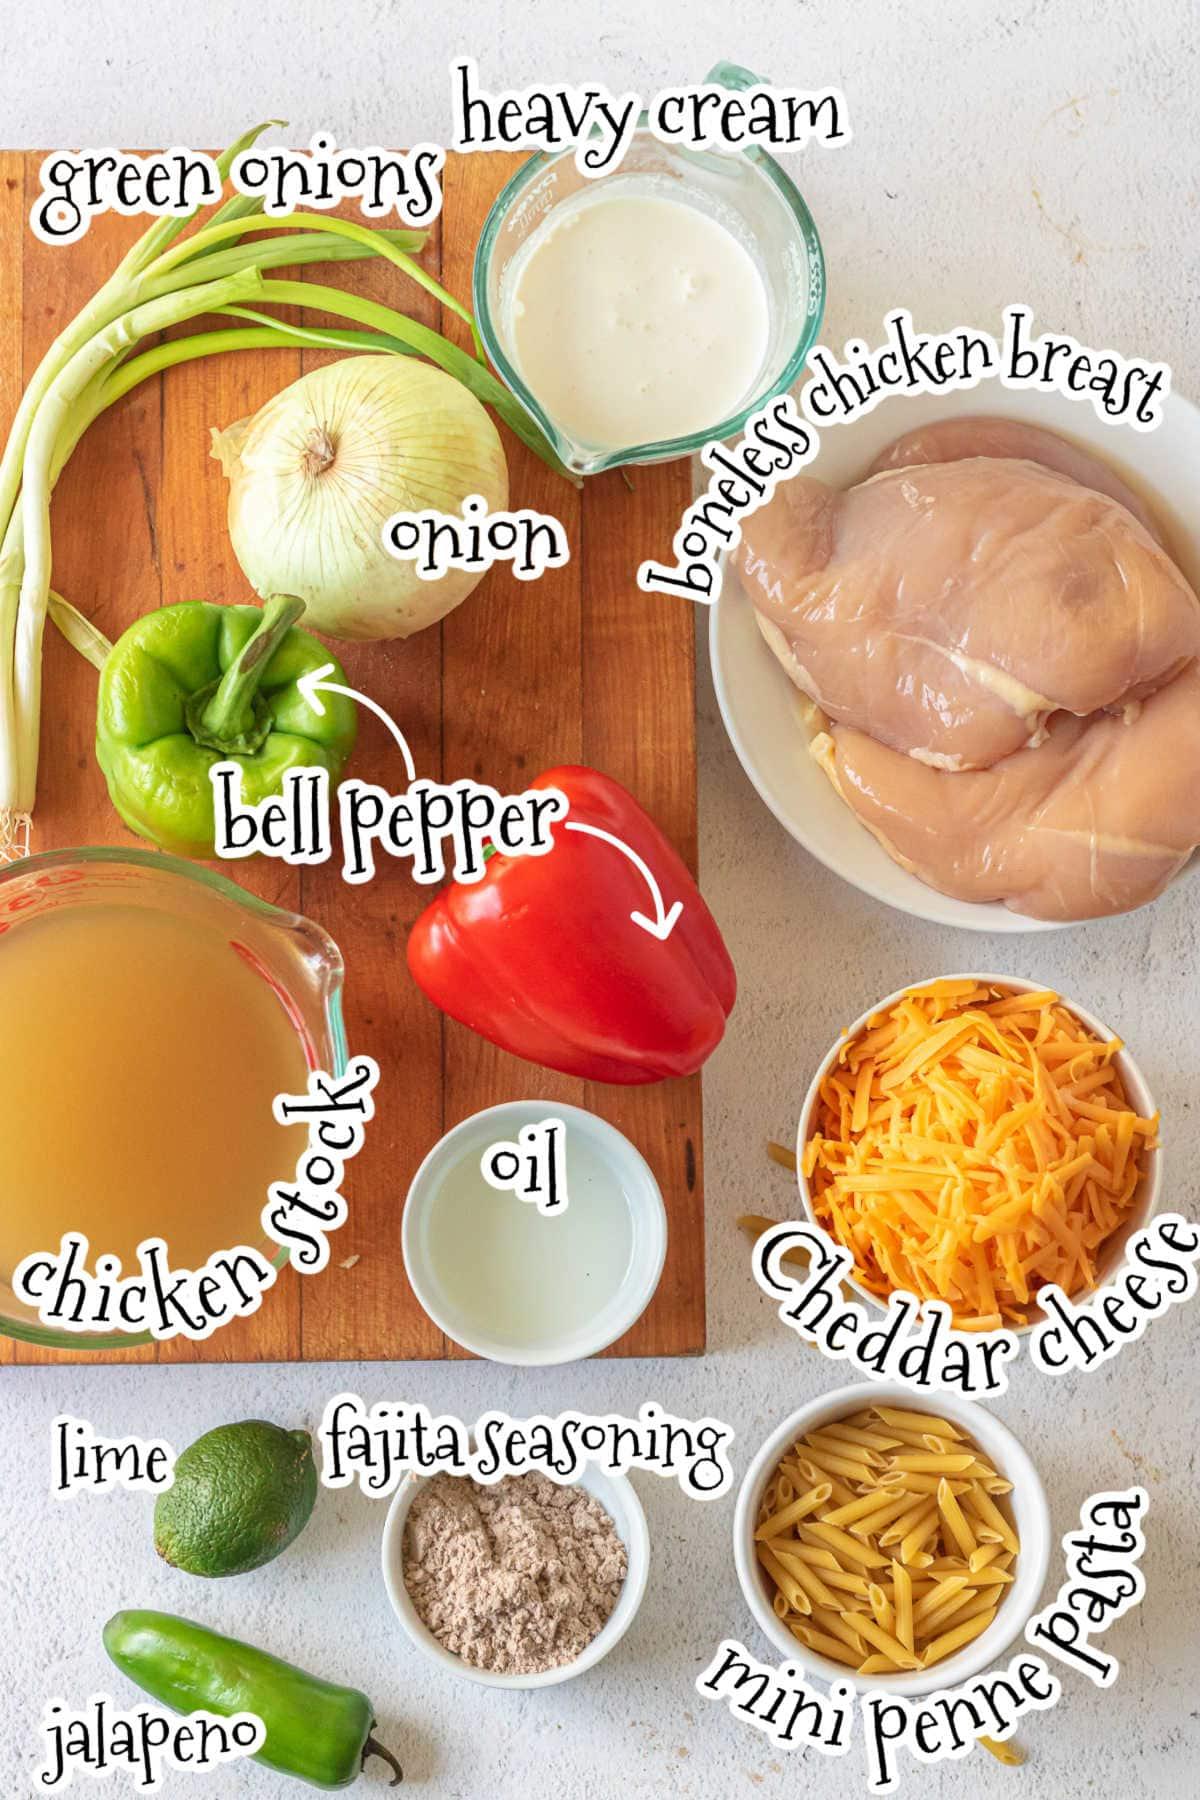 Labeled ingredients for fajita chicken pasta recipe.